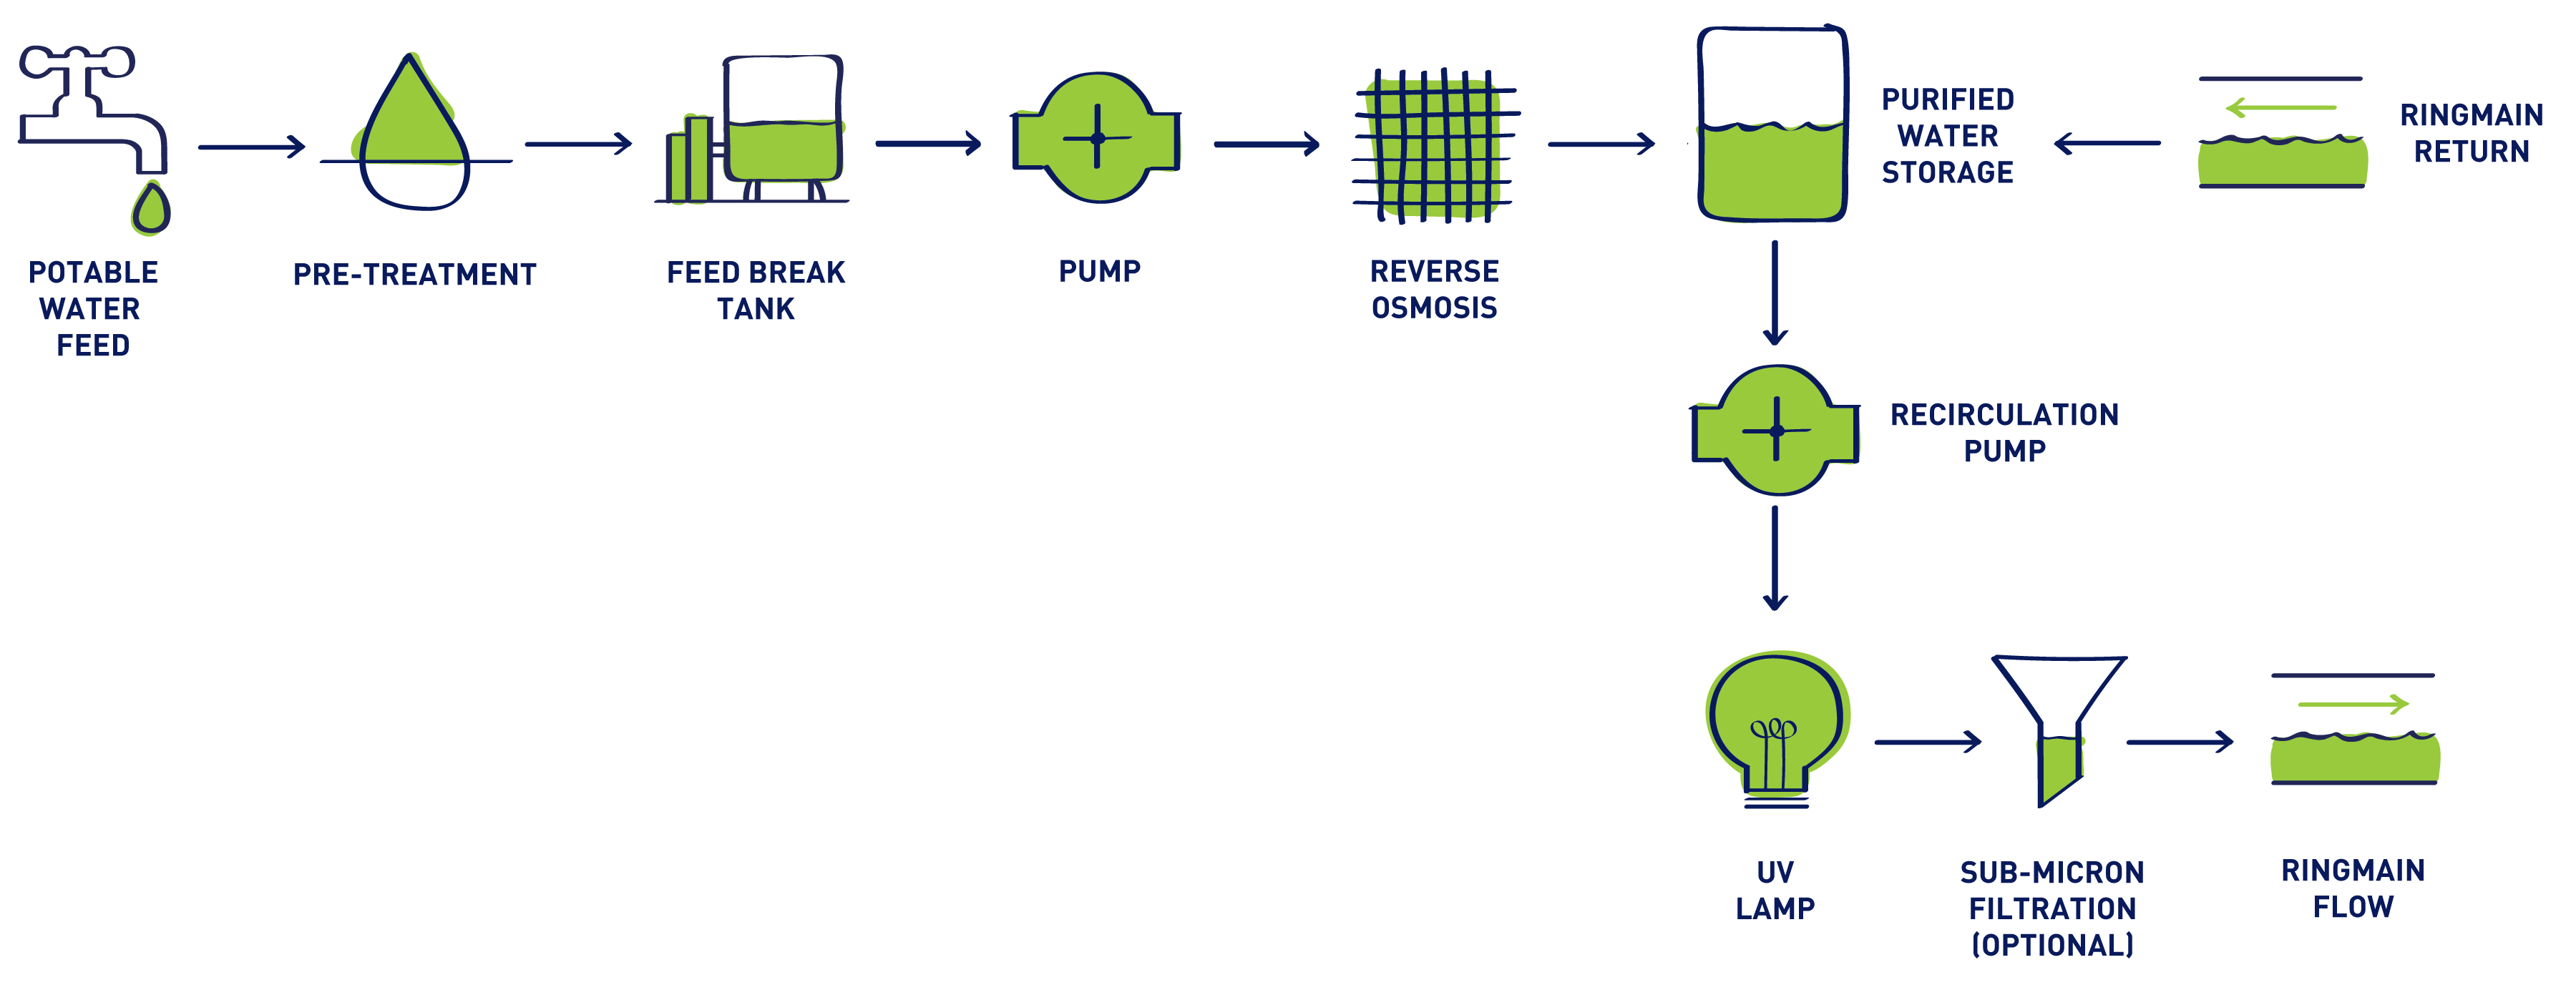 Integra r process diagram suez water integra r process diagram publicscrutiny Image collections